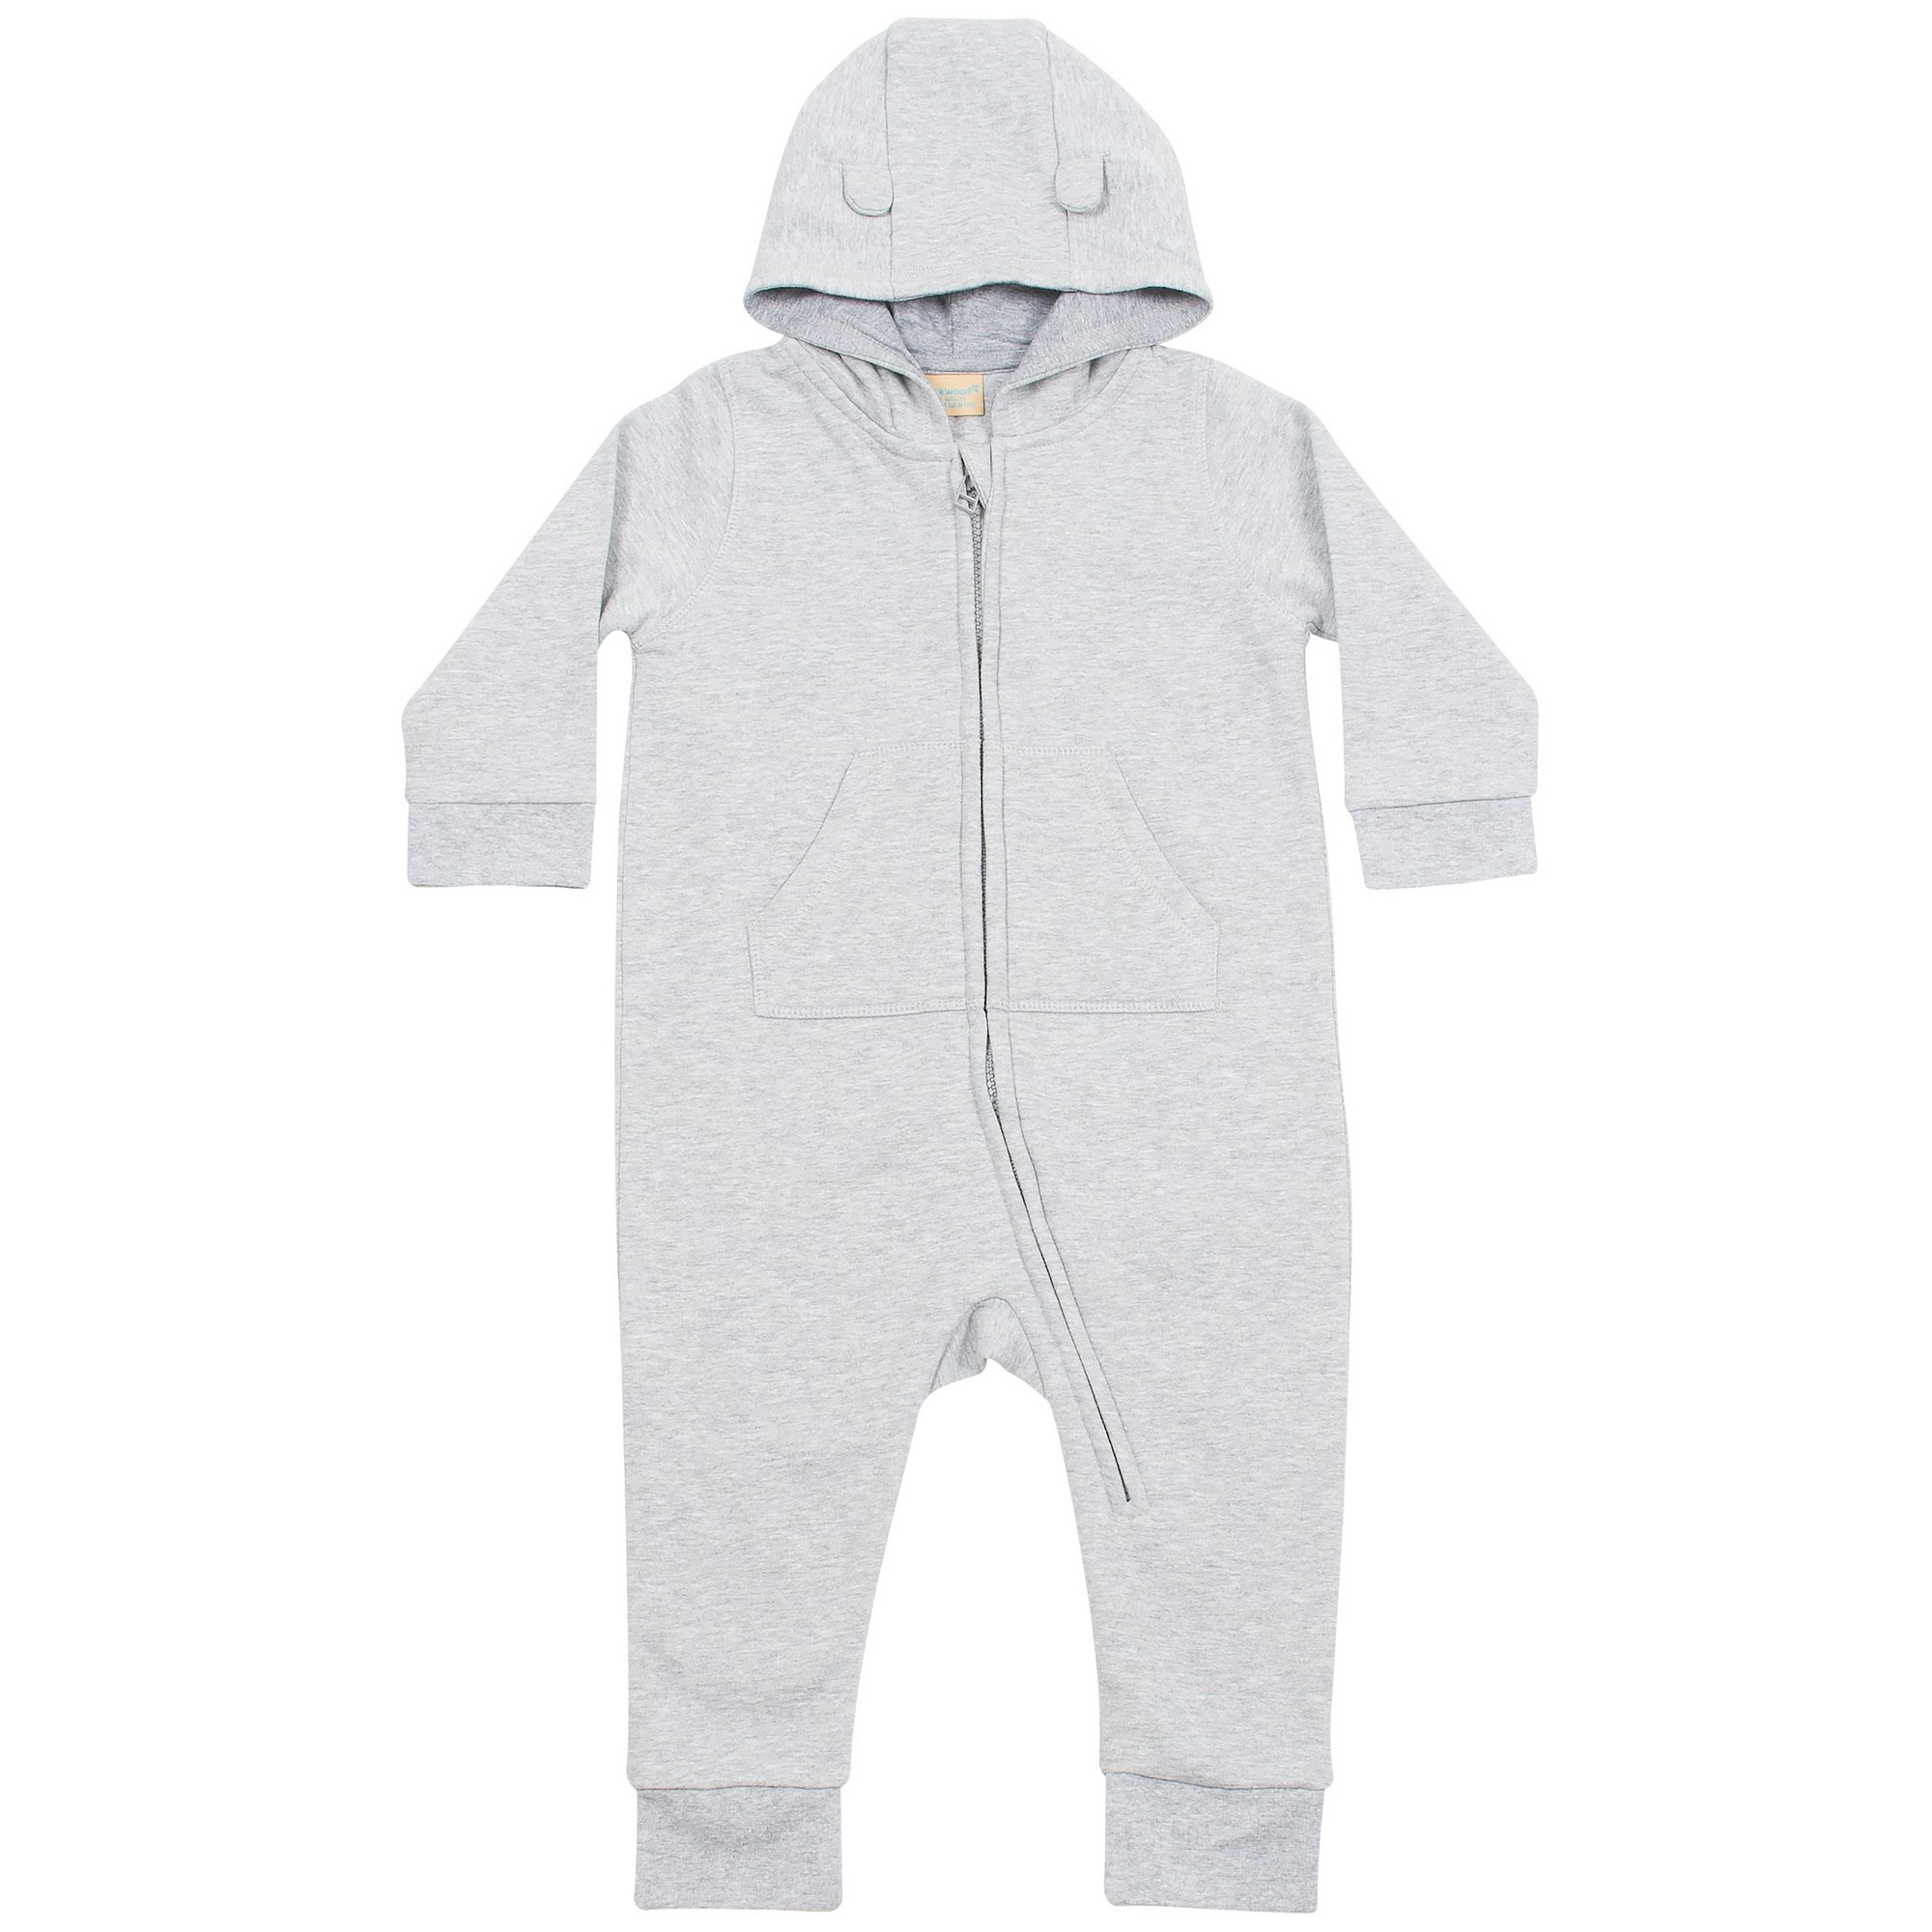 8287712a4 Larkwood Baby Unisex Fleece All-in-one Romper Suit 18-24 Months ...